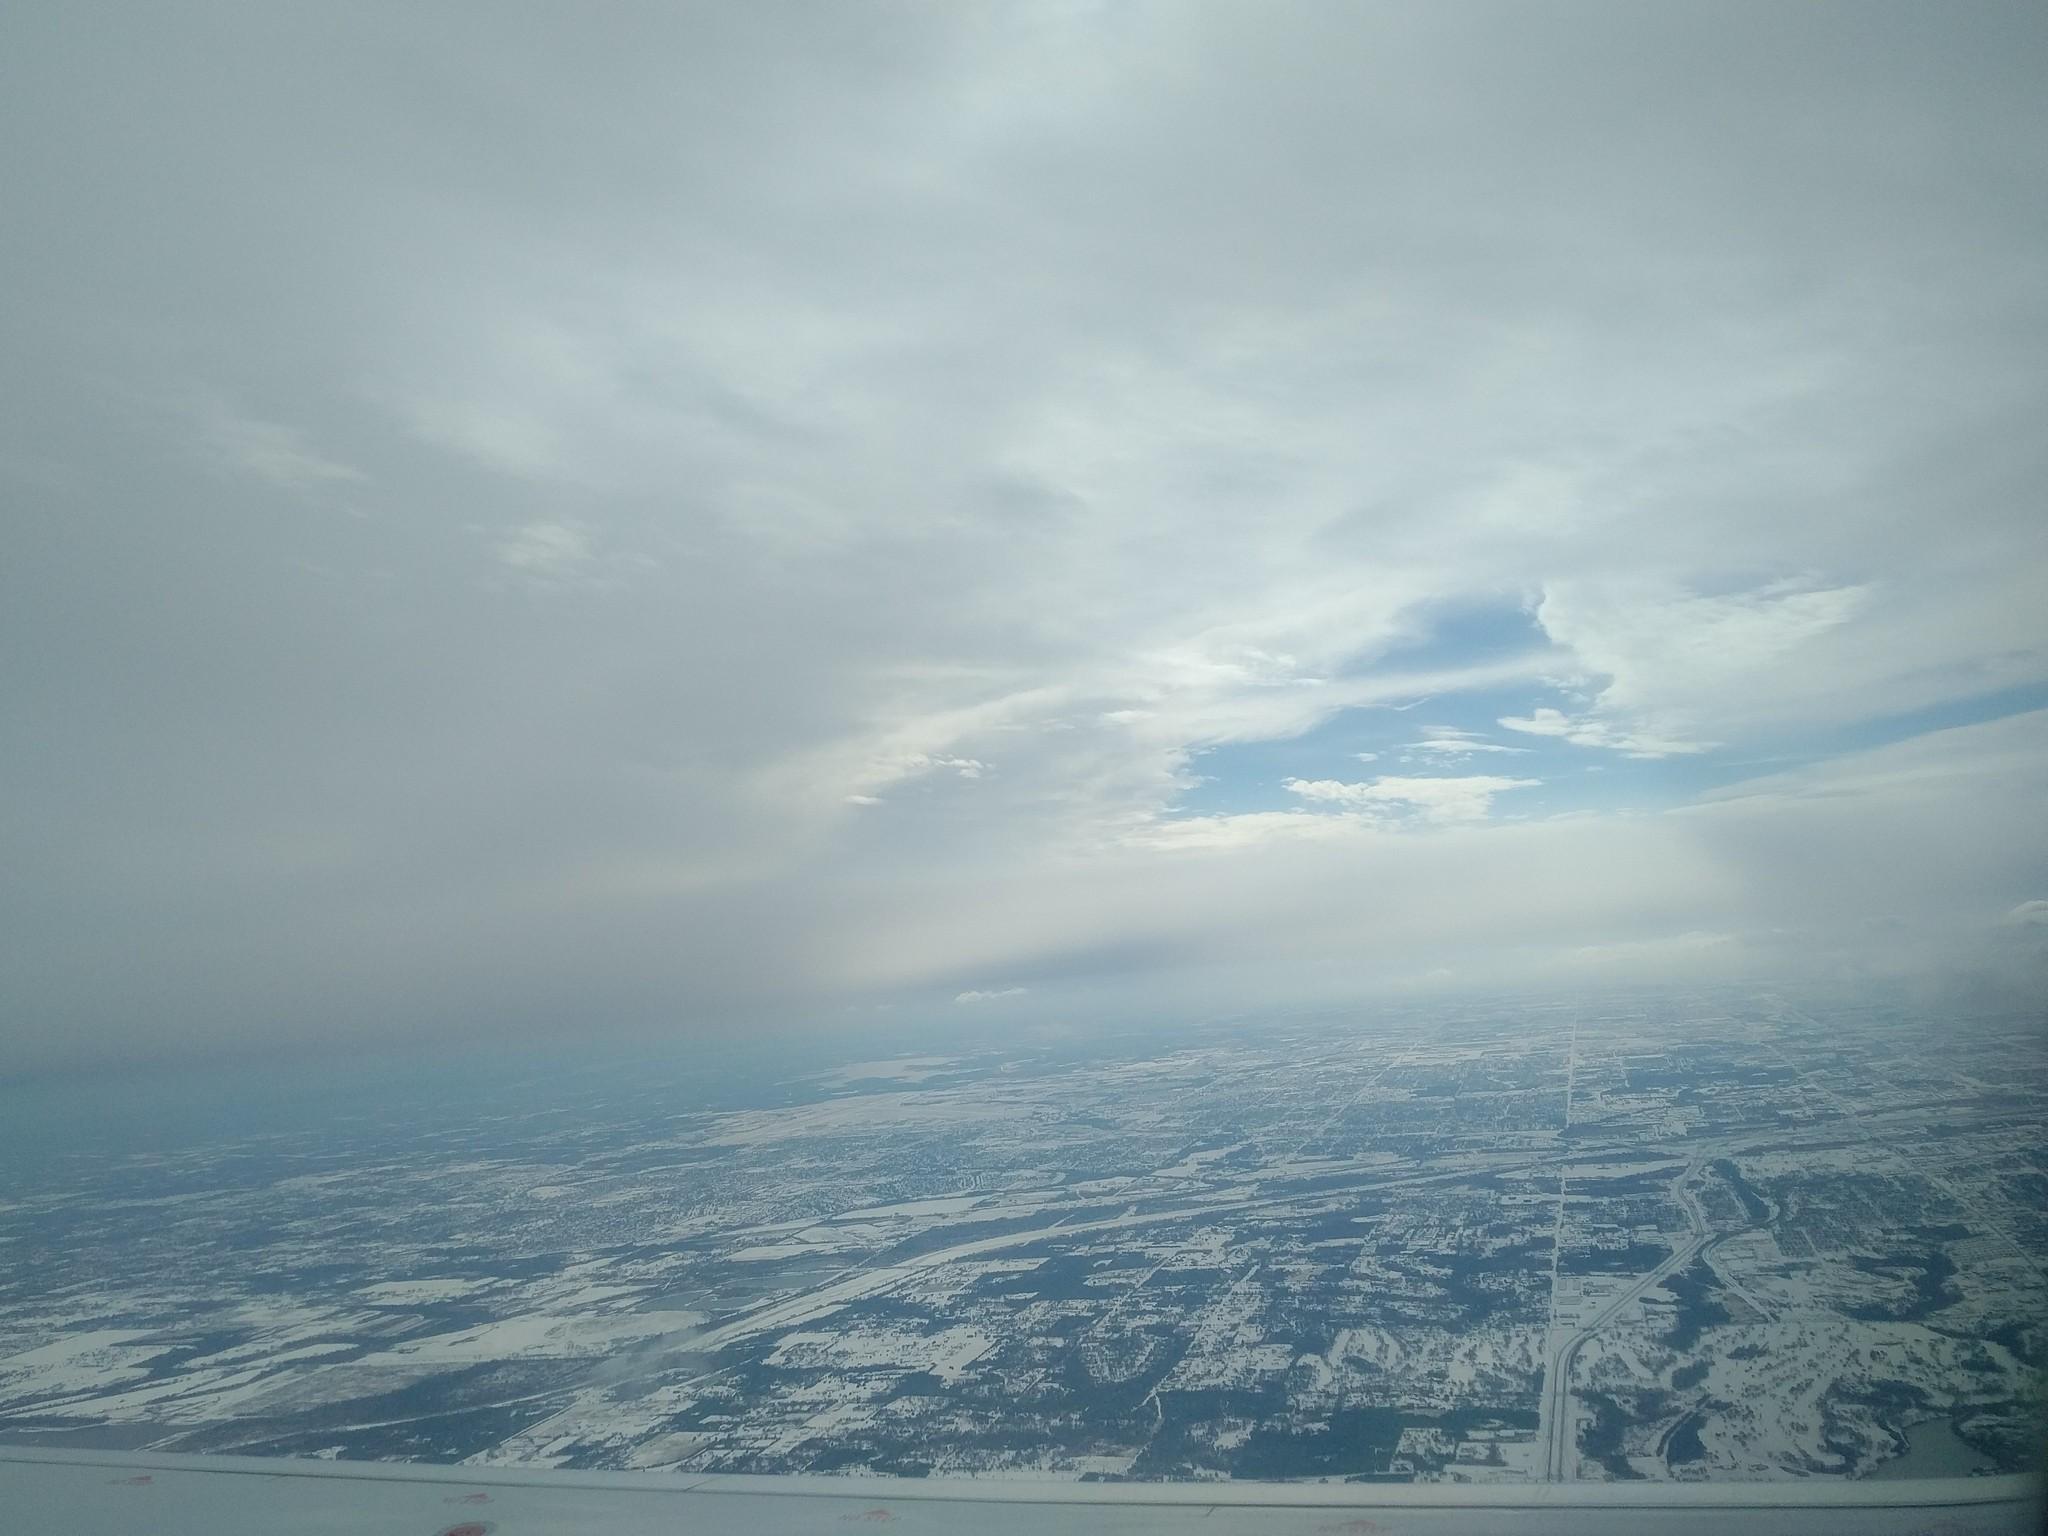 Snow Covered OKC